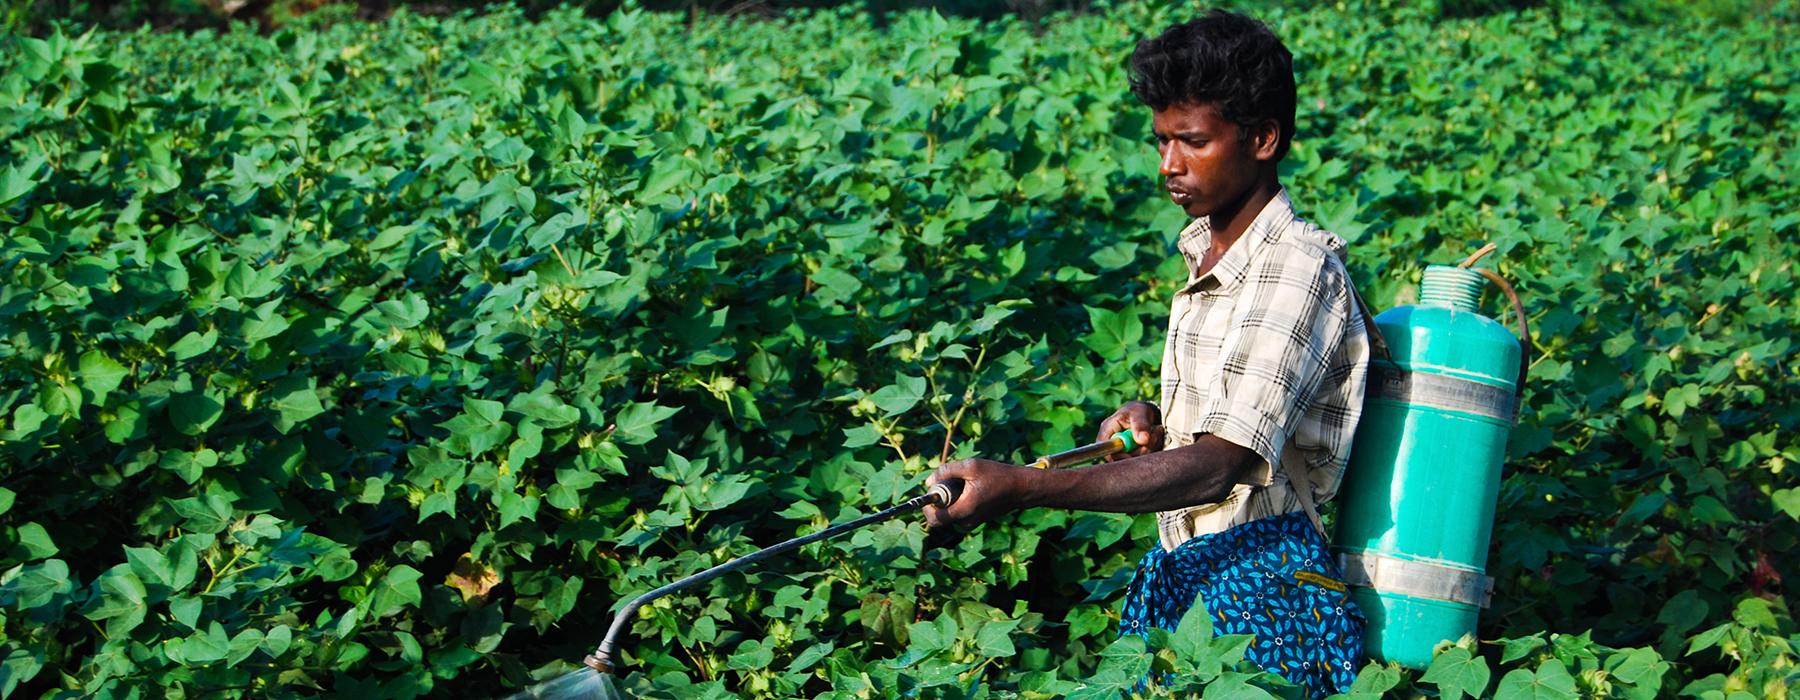 Eradicating toxic pesticides